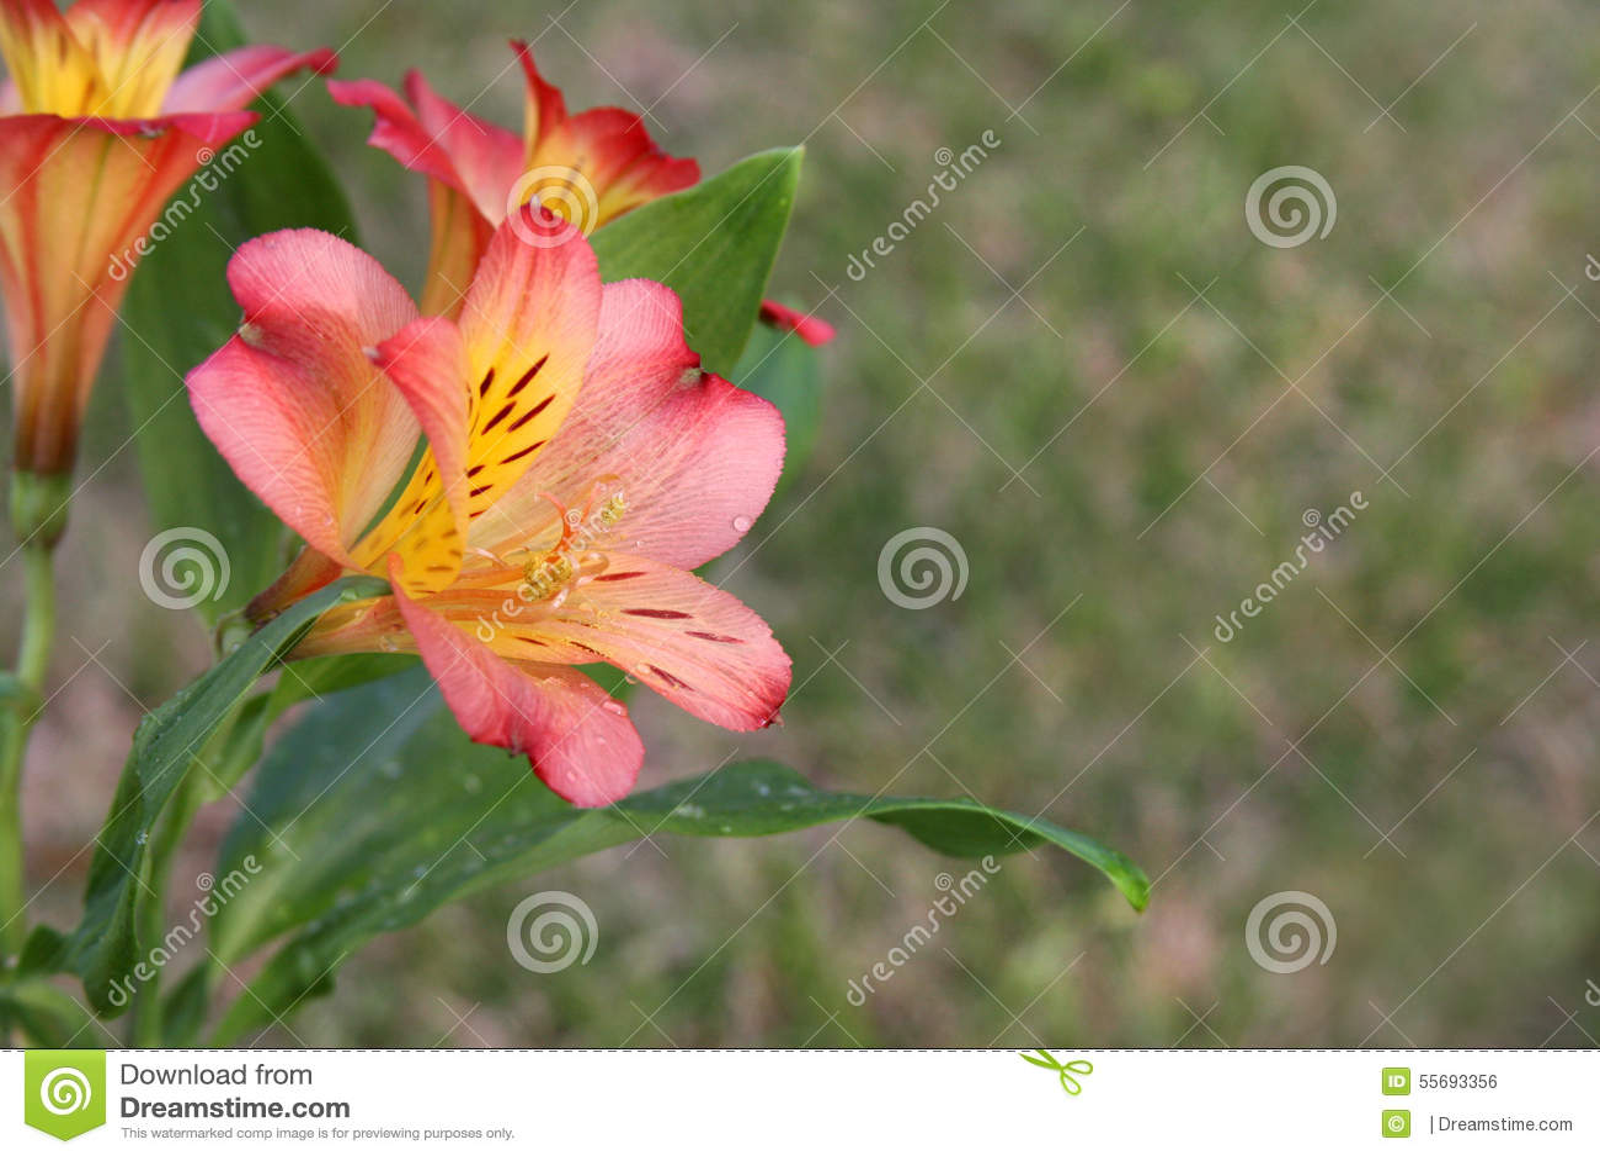 Alstroemeria saturne or peruvian lily flower stock photo image of alstroemeria saturne or peruvian lily flower izmirmasajfo Gallery